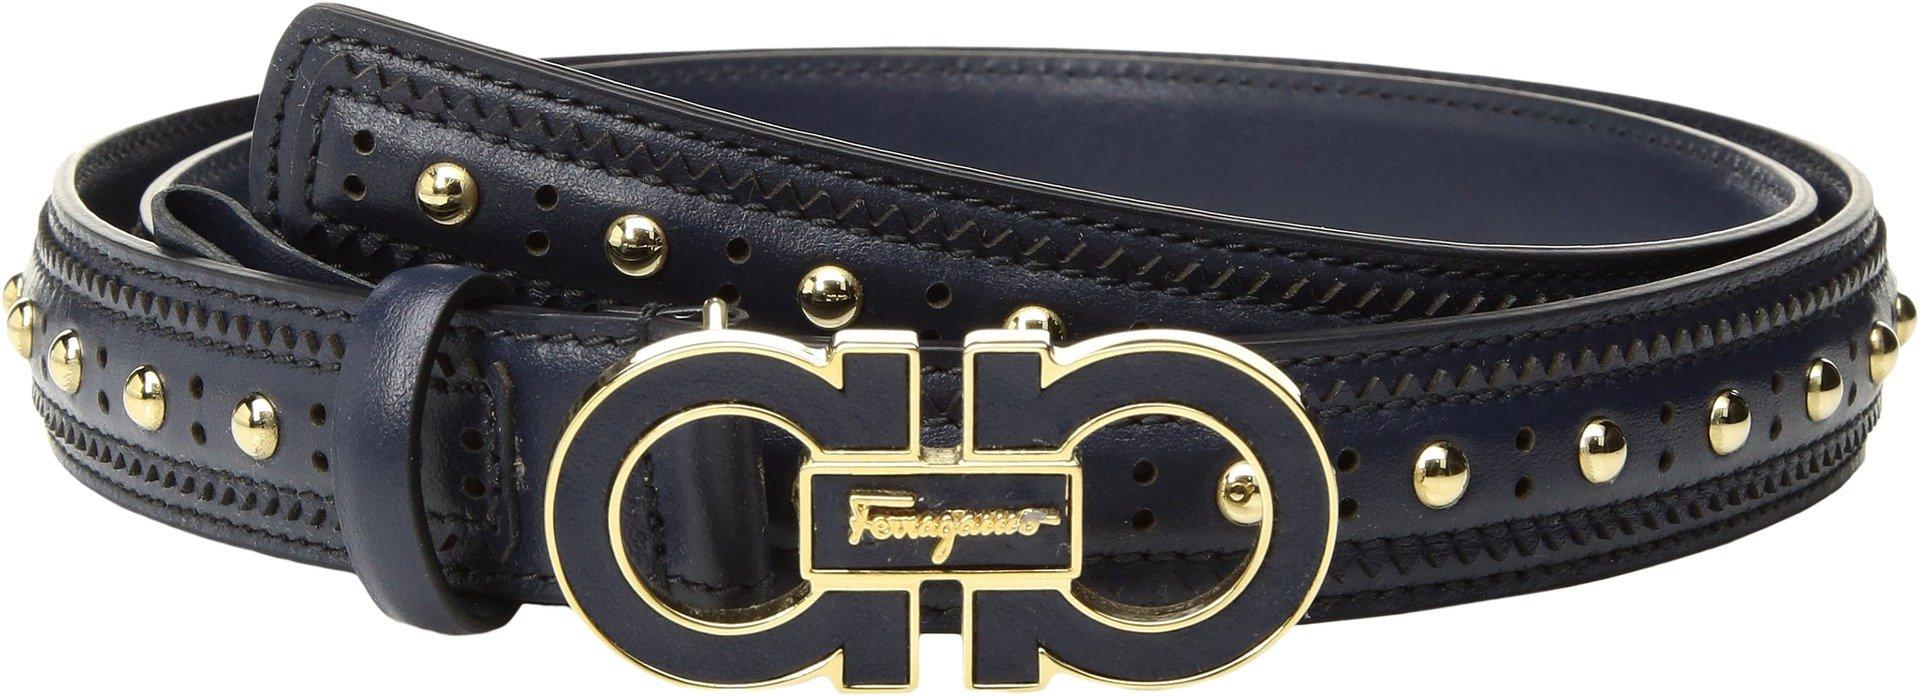 Salvatore Ferragamo Women's 23B513 Belt Mirto 100 (40'' Waist) by Salvatore Ferragamo